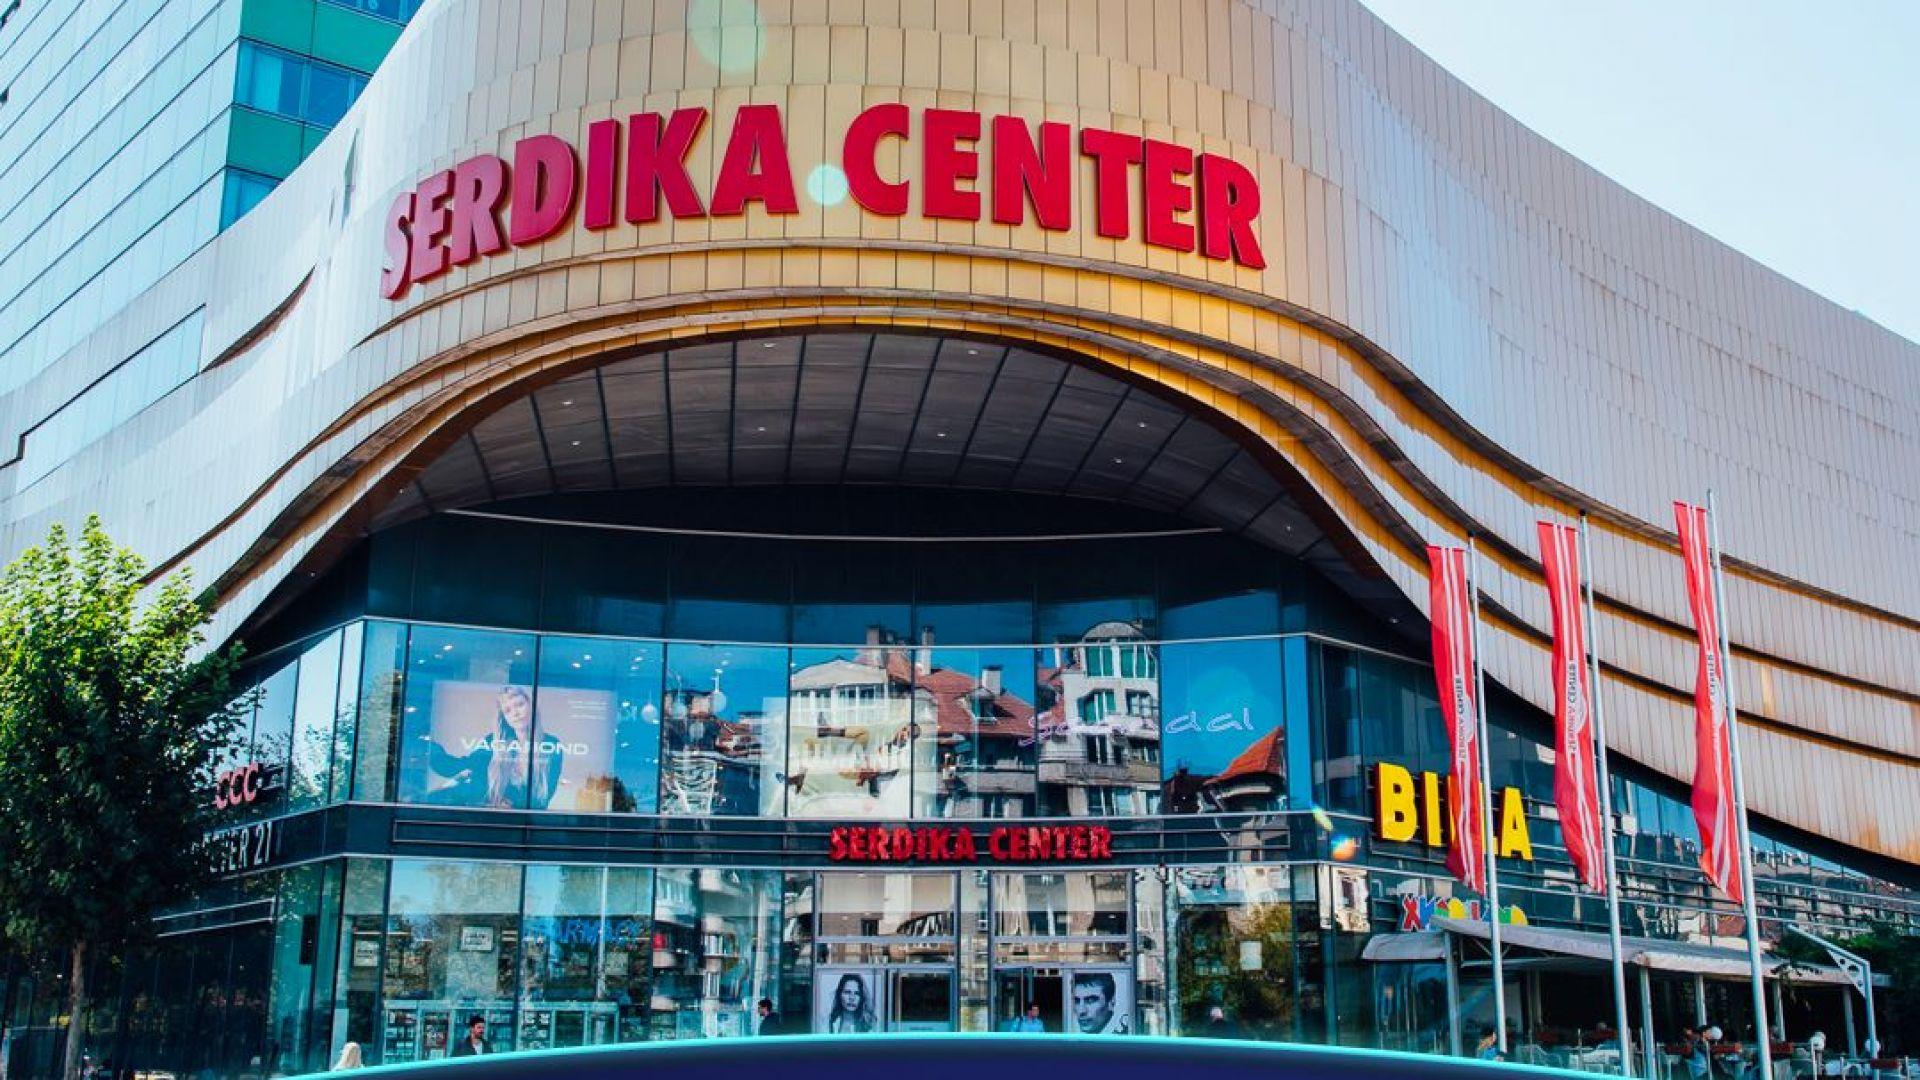 5 нови обекта и Spark зона отварят в Сердика Център